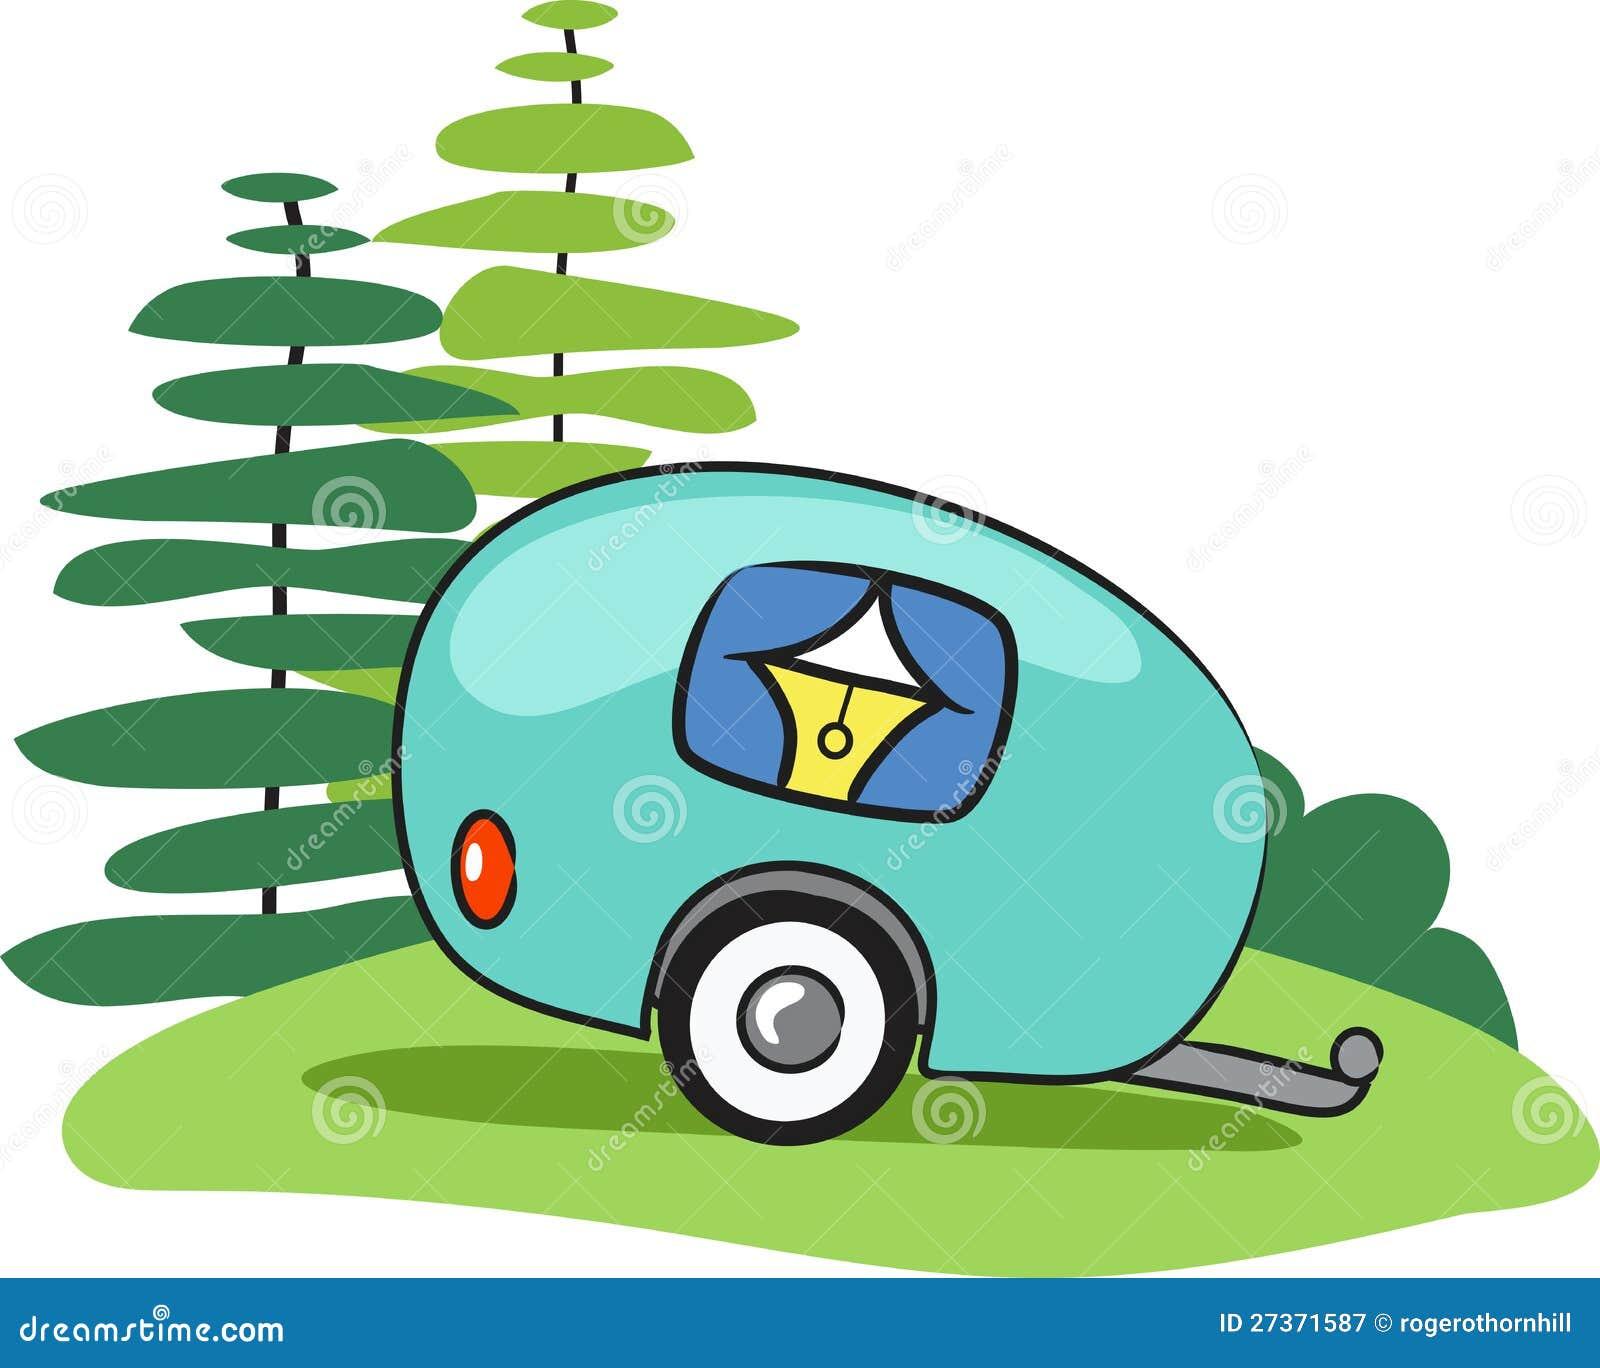 Vector Happy Camper Trailor Cartoon Illustration Of Stock